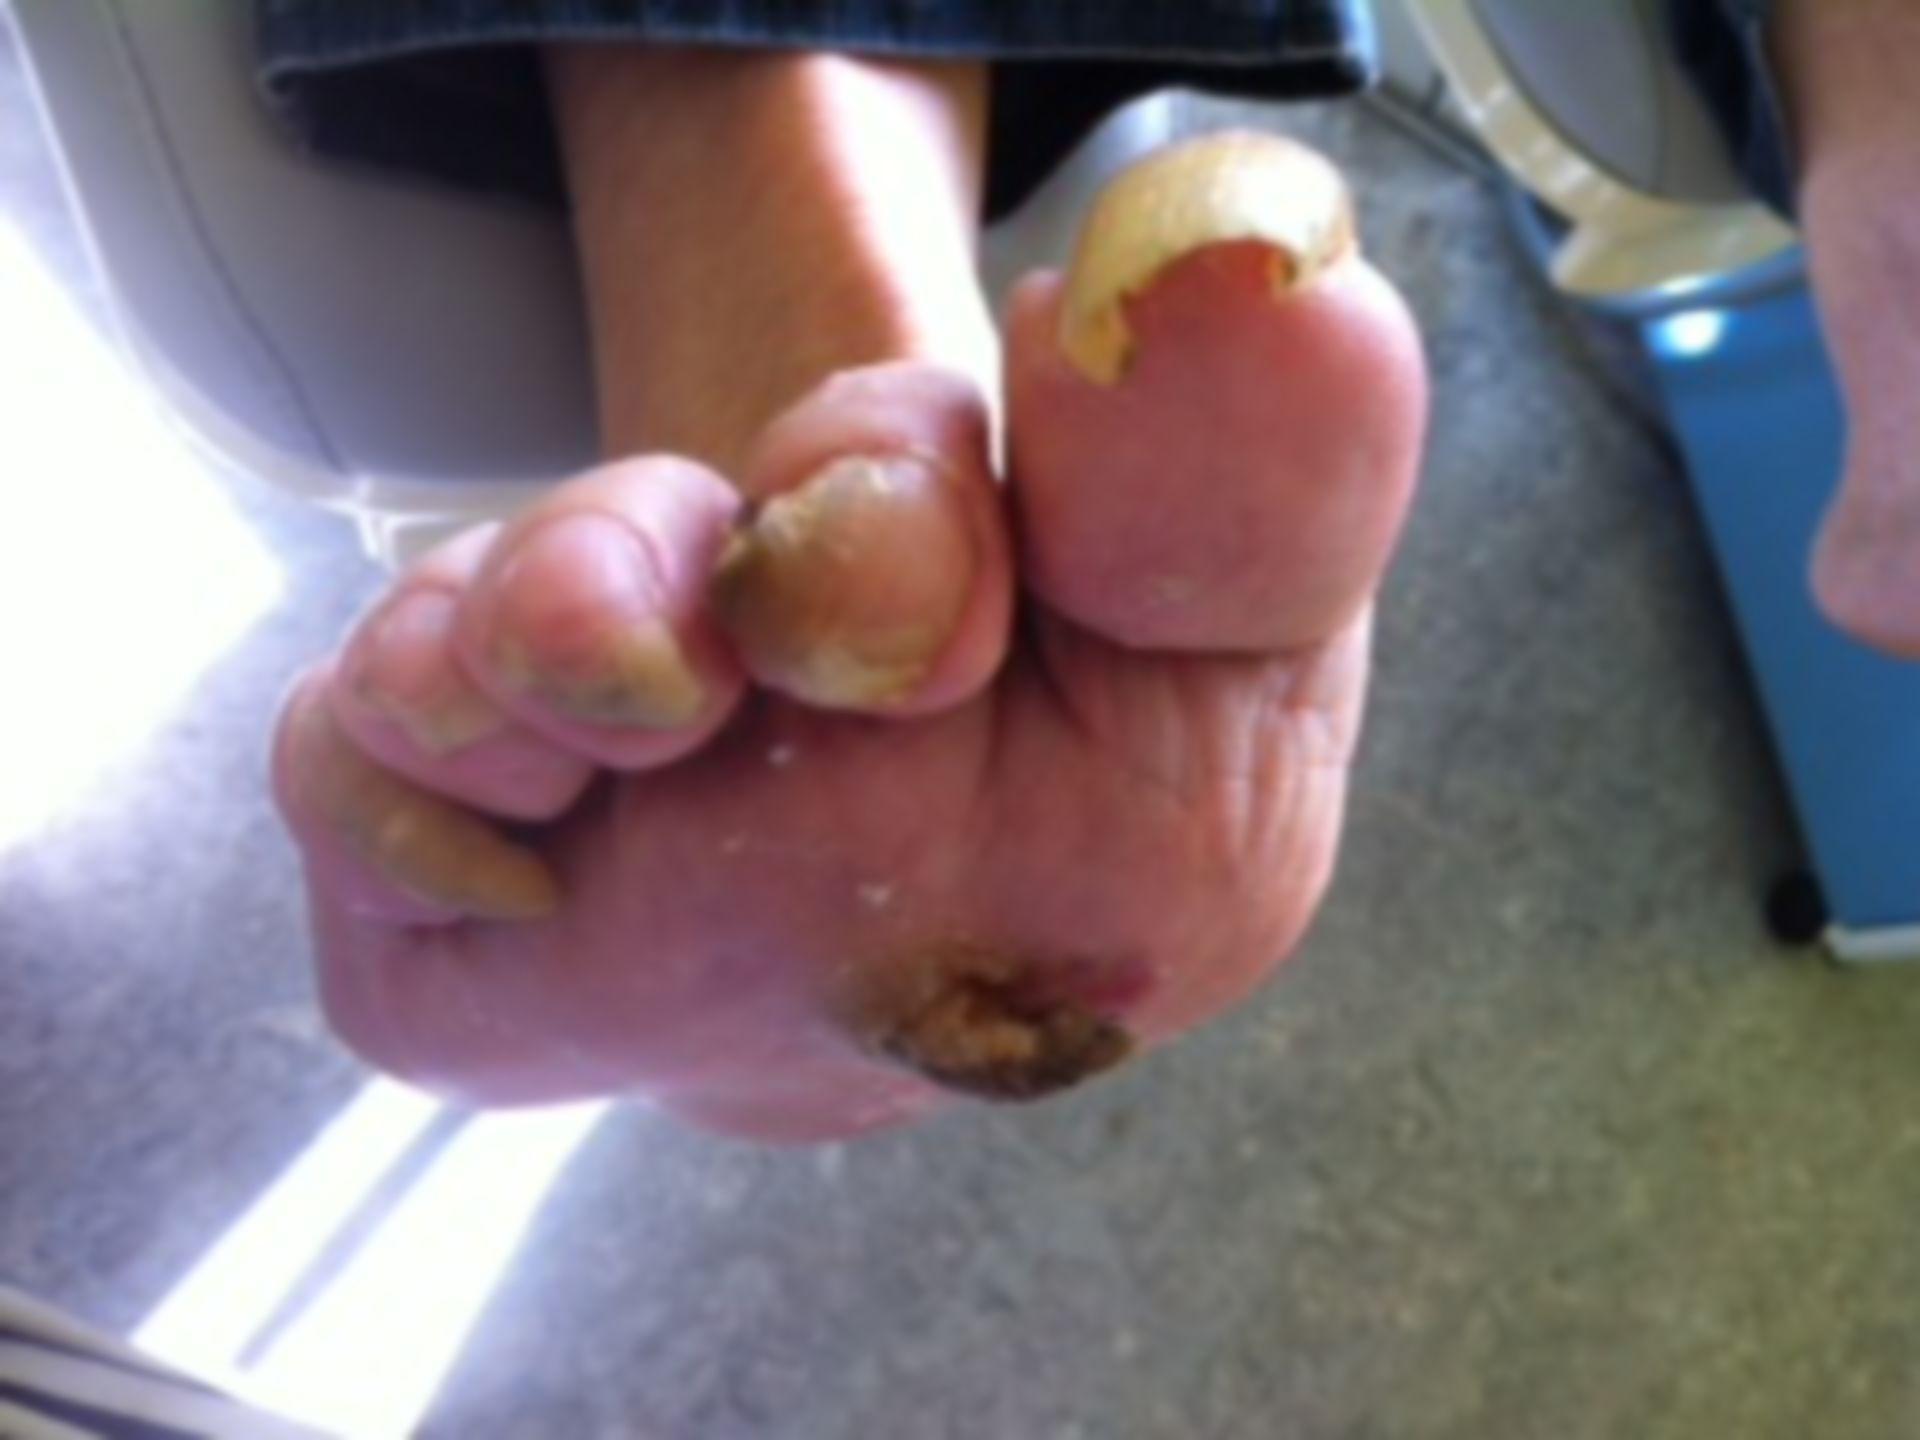 Foot of a diabetes mellitus patient